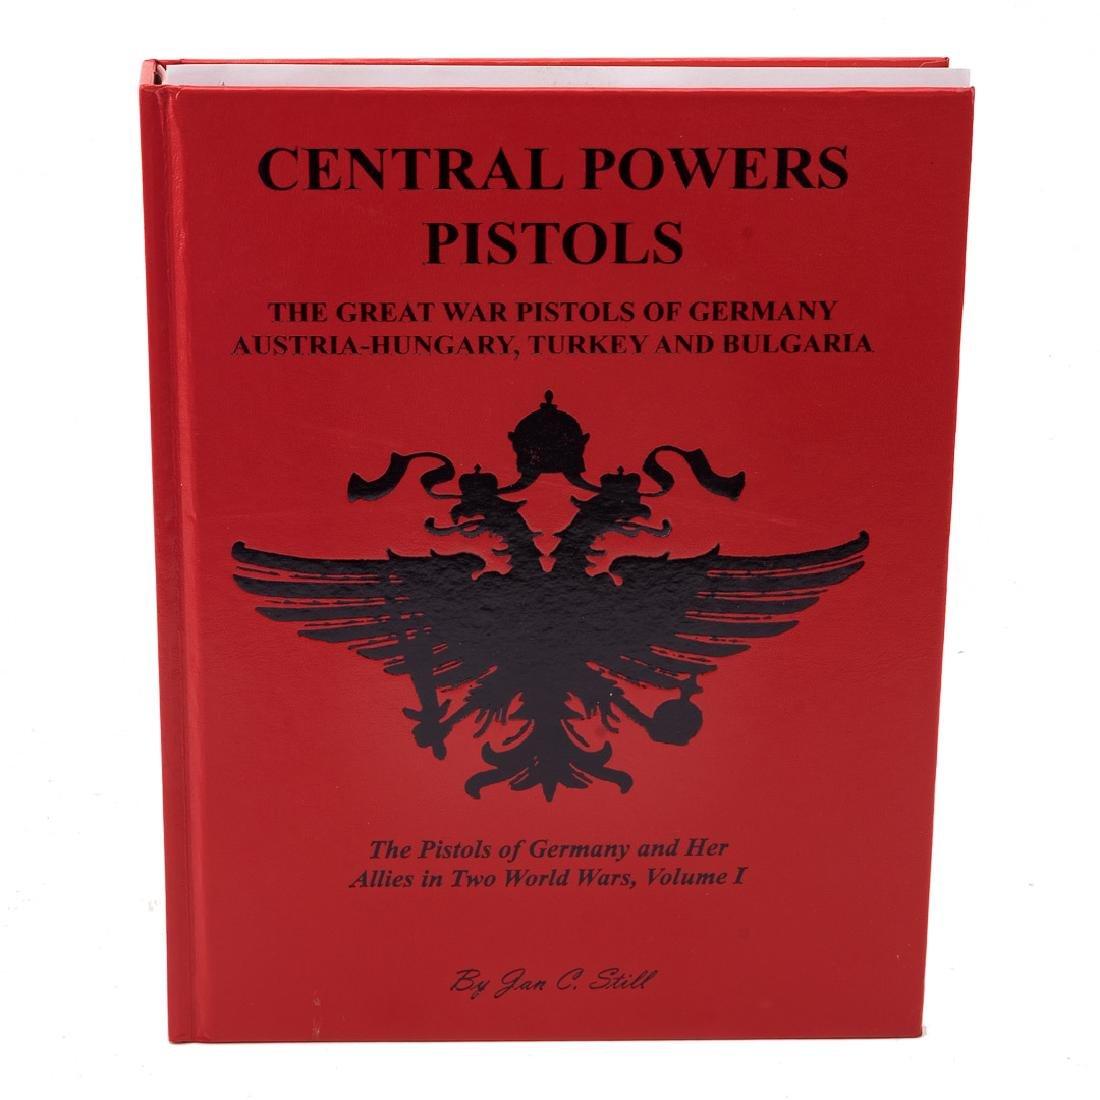 Central Powers Pistols hardback